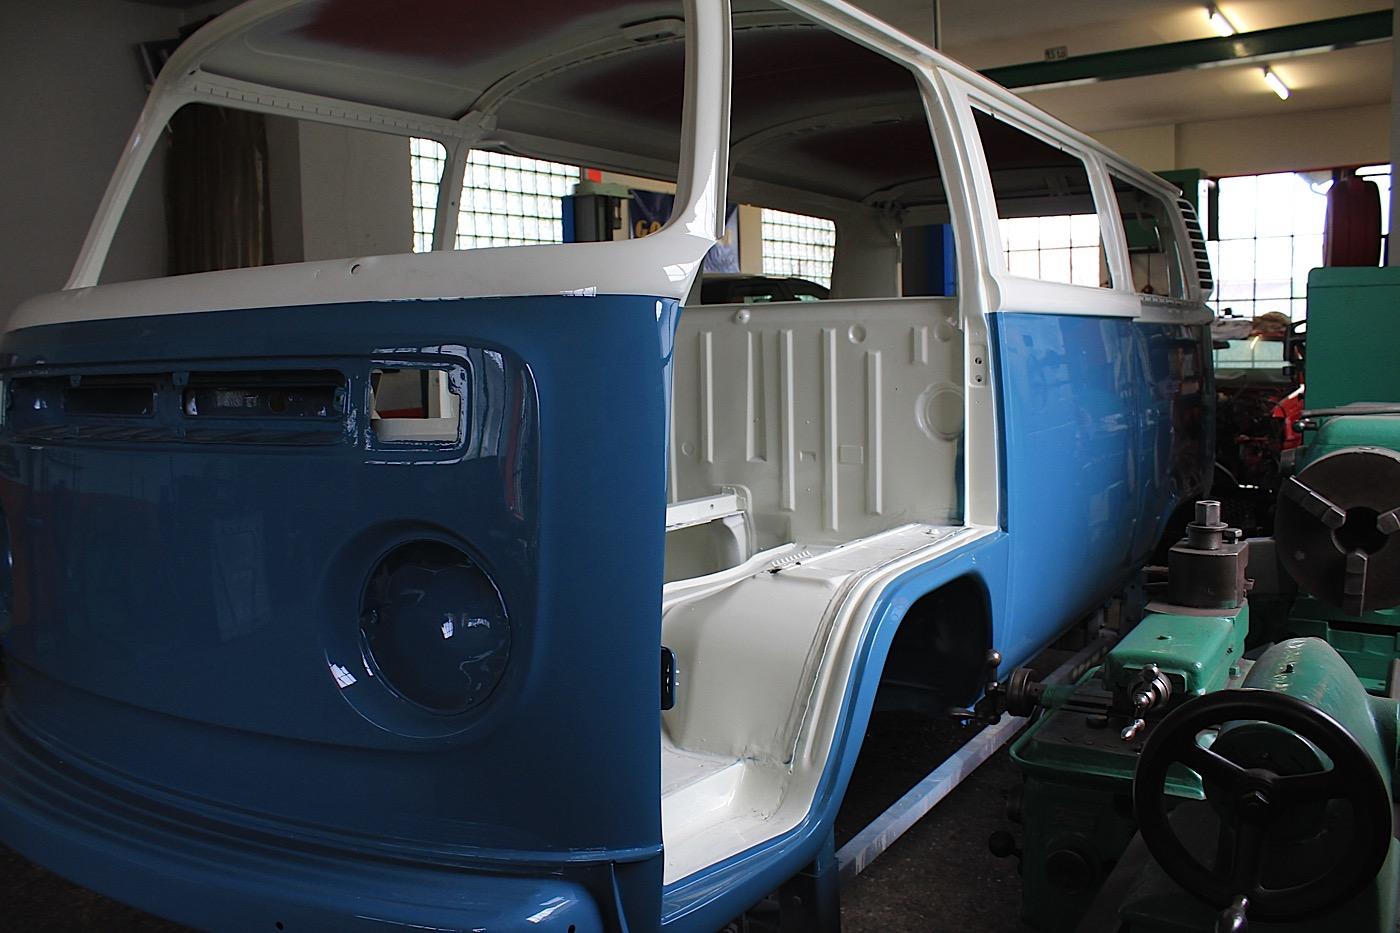 Vw Bus 2015 >> VW Bus T2 - Holucar Oldtimerrestaurierung